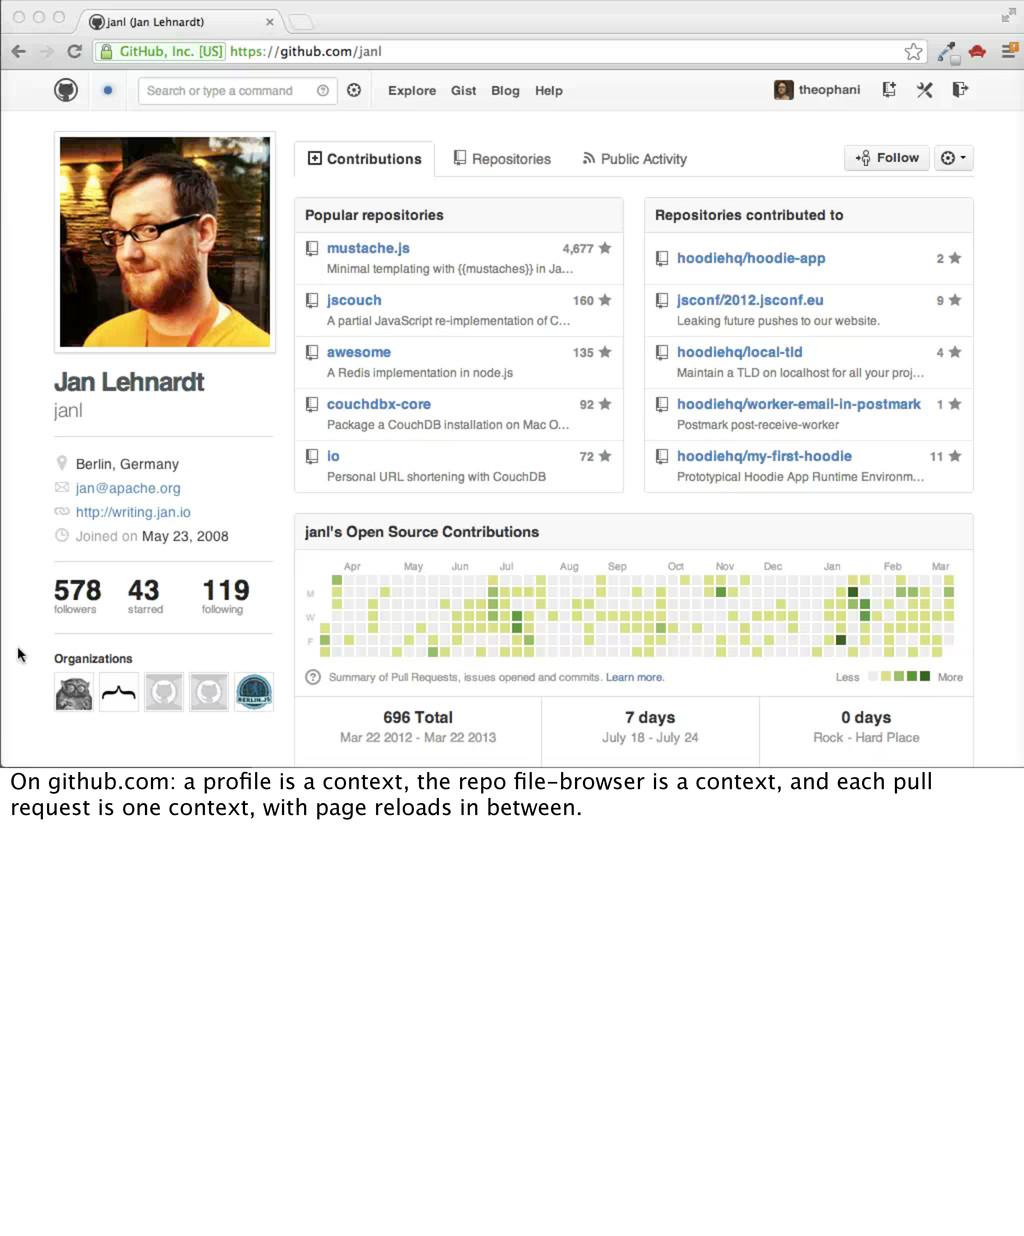 On github.com: a profile is a context, the repo ...